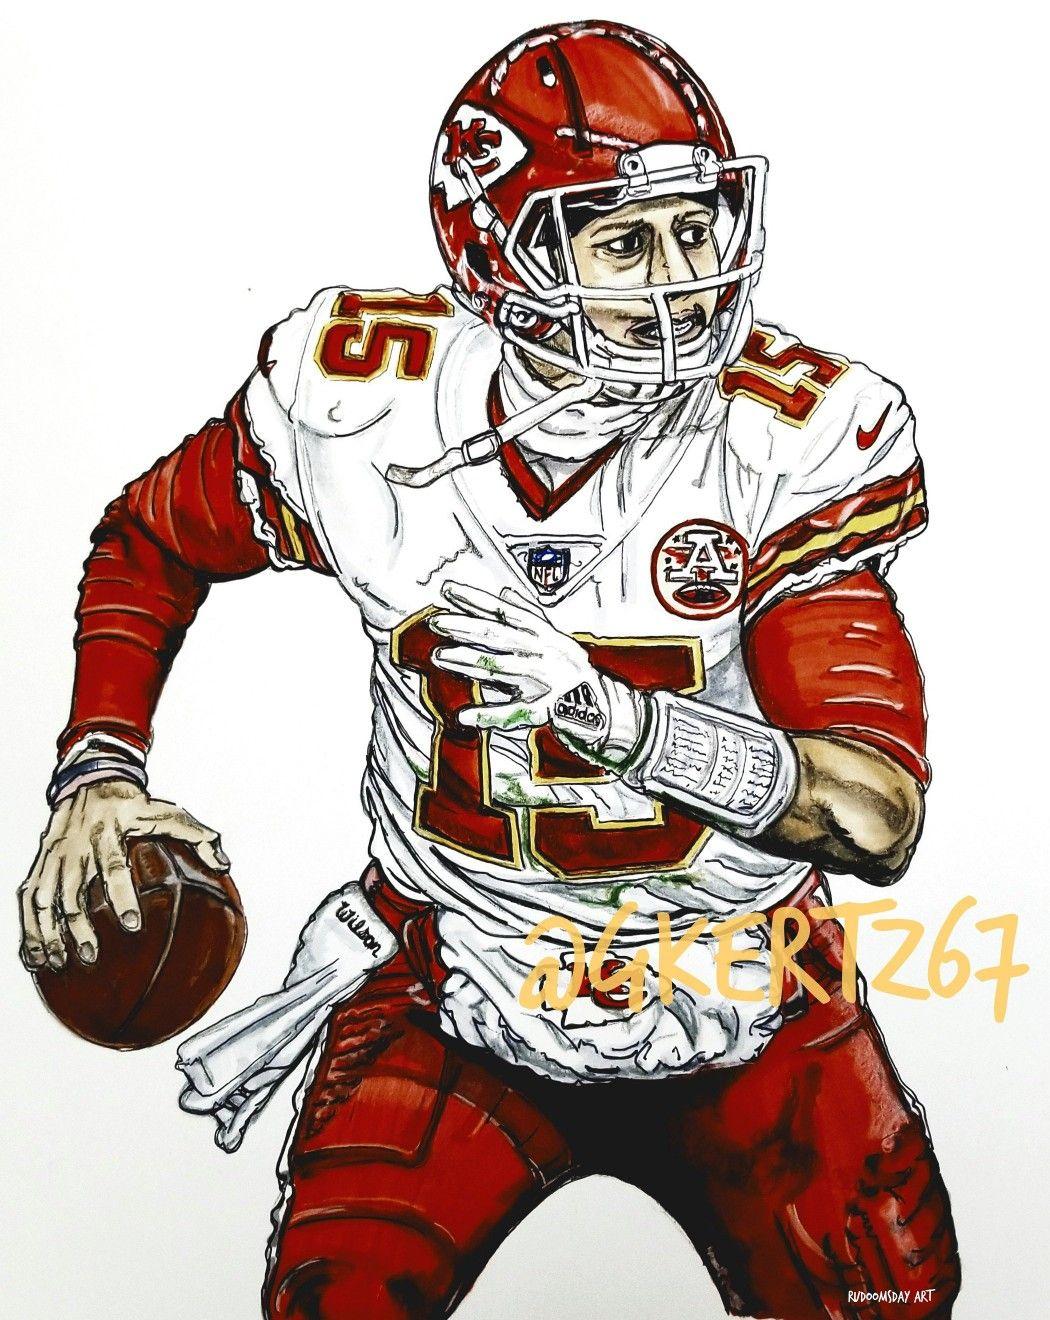 Patrick Mahomes Ii Kansas City Chiefs Qb 15 Artwork By Glen Kertes Nfl Football Art Sports Art Football Art